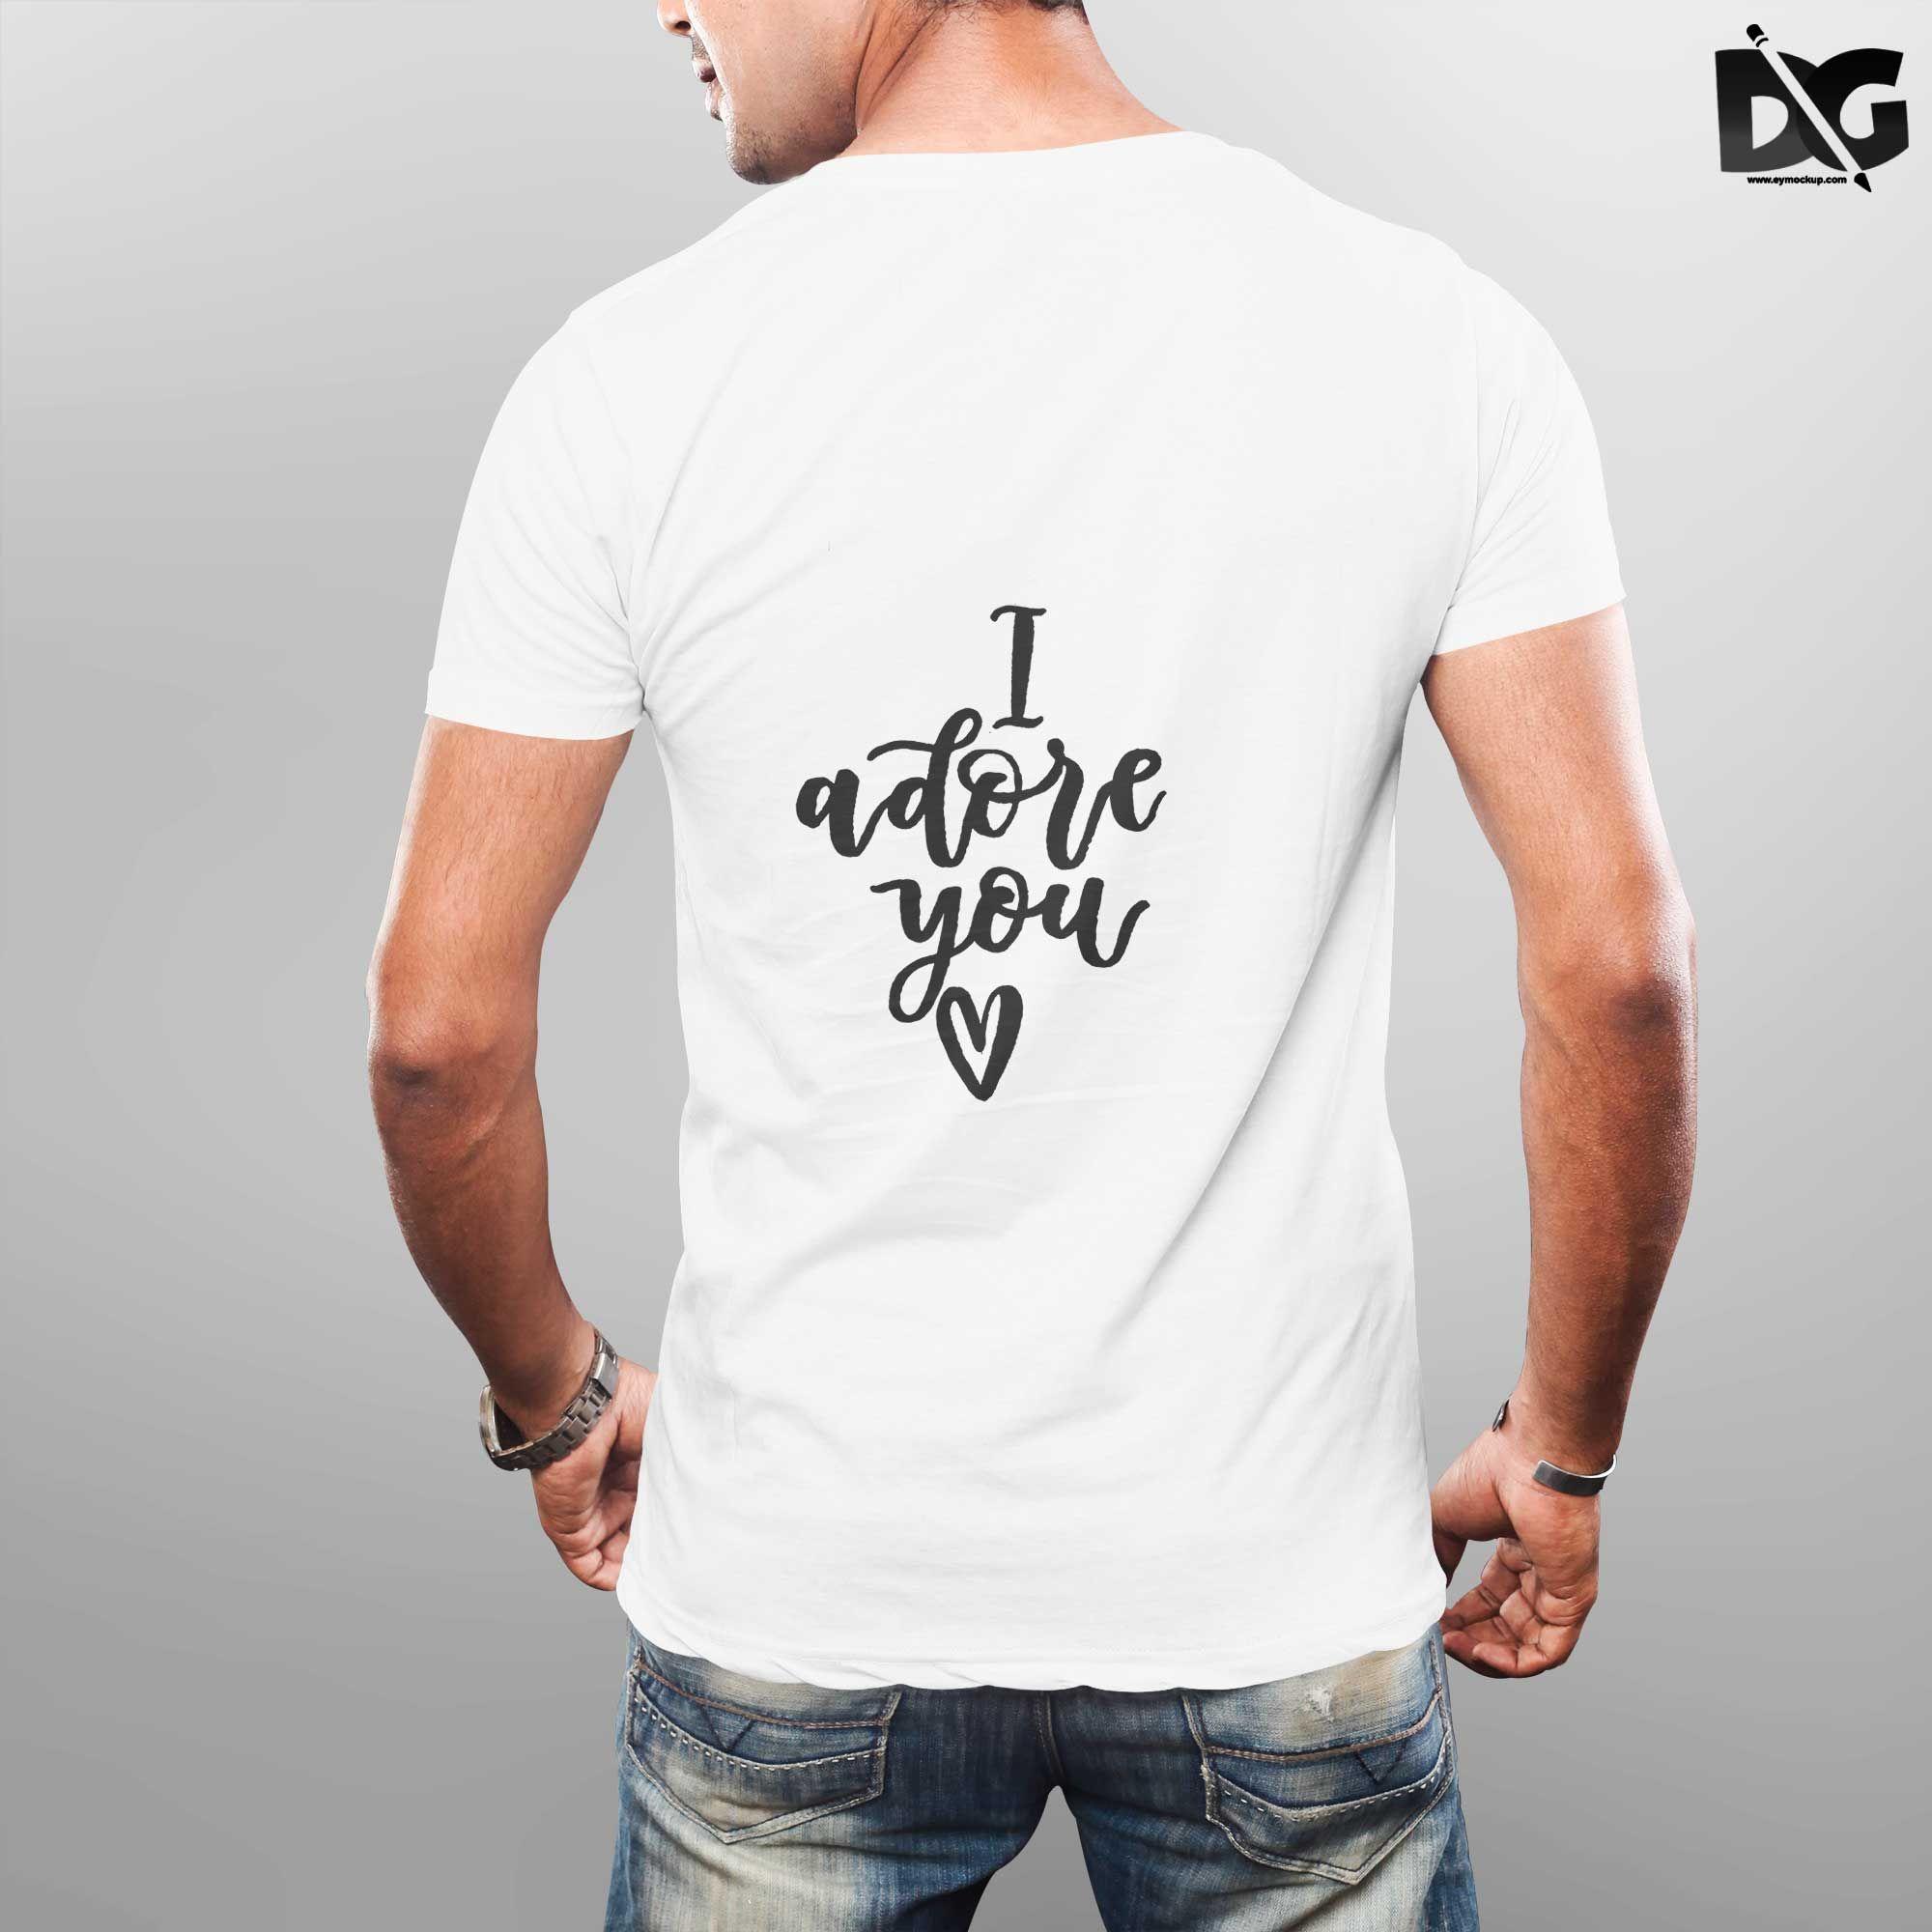 Download Free Premium Tshirt Back Psd Mockups Free Logo Mockup Logo Design Mockup Clothing Mockup